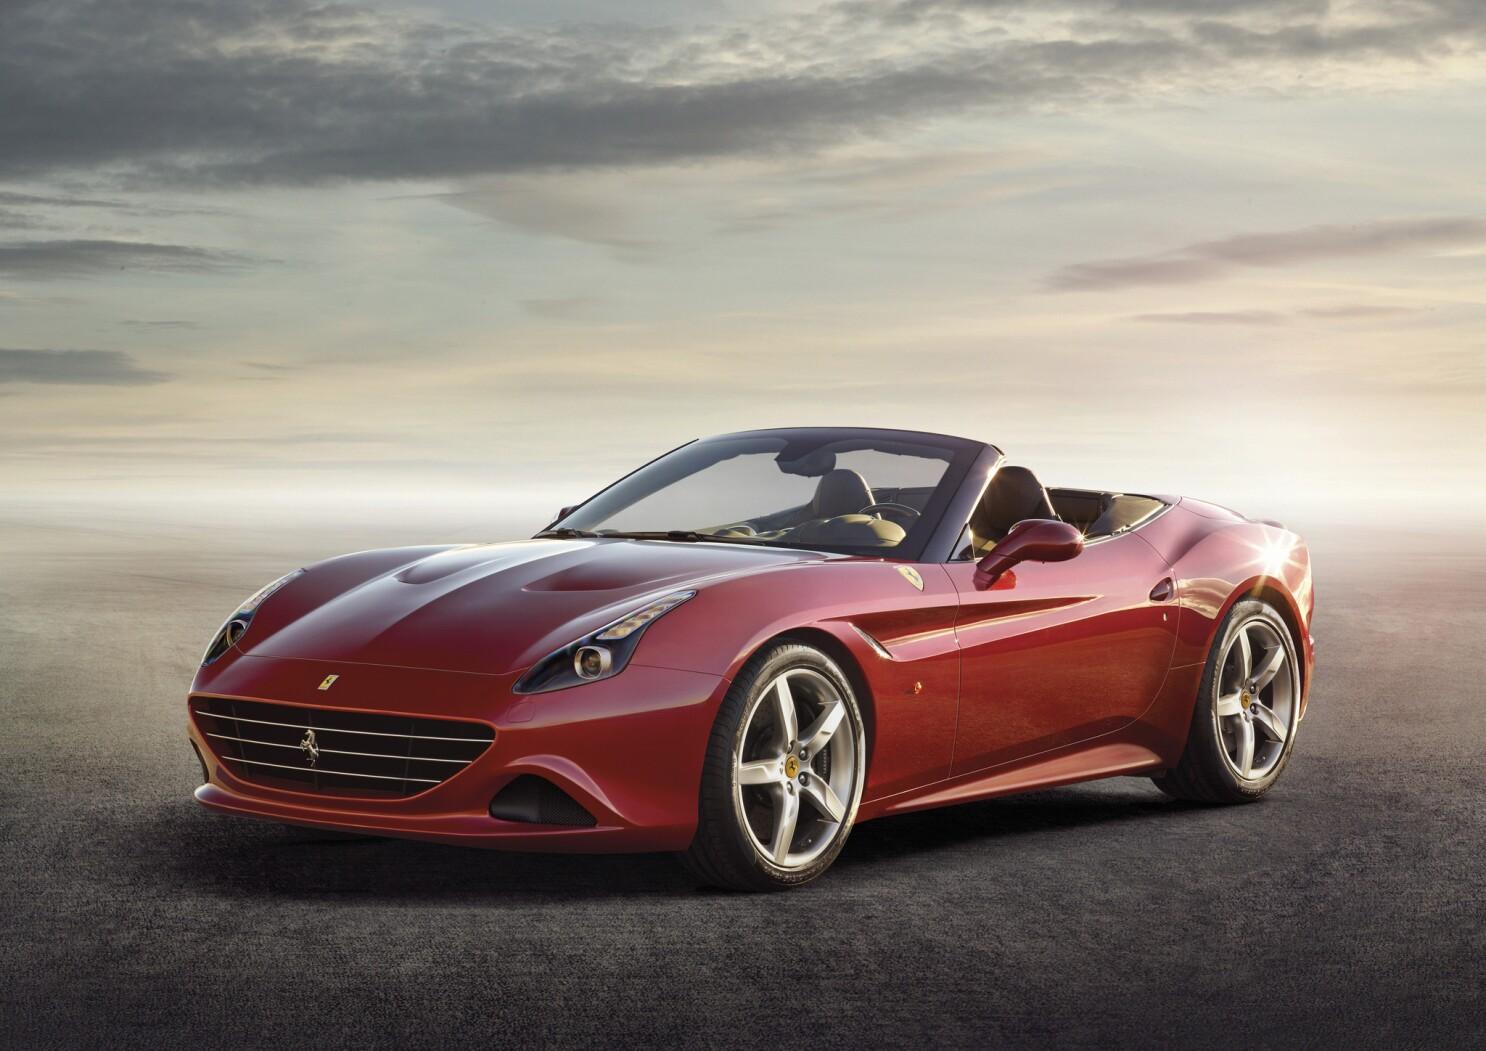 Geneva Motor Show Ferrari Returns To Turbocharging With California T Los Angeles Times